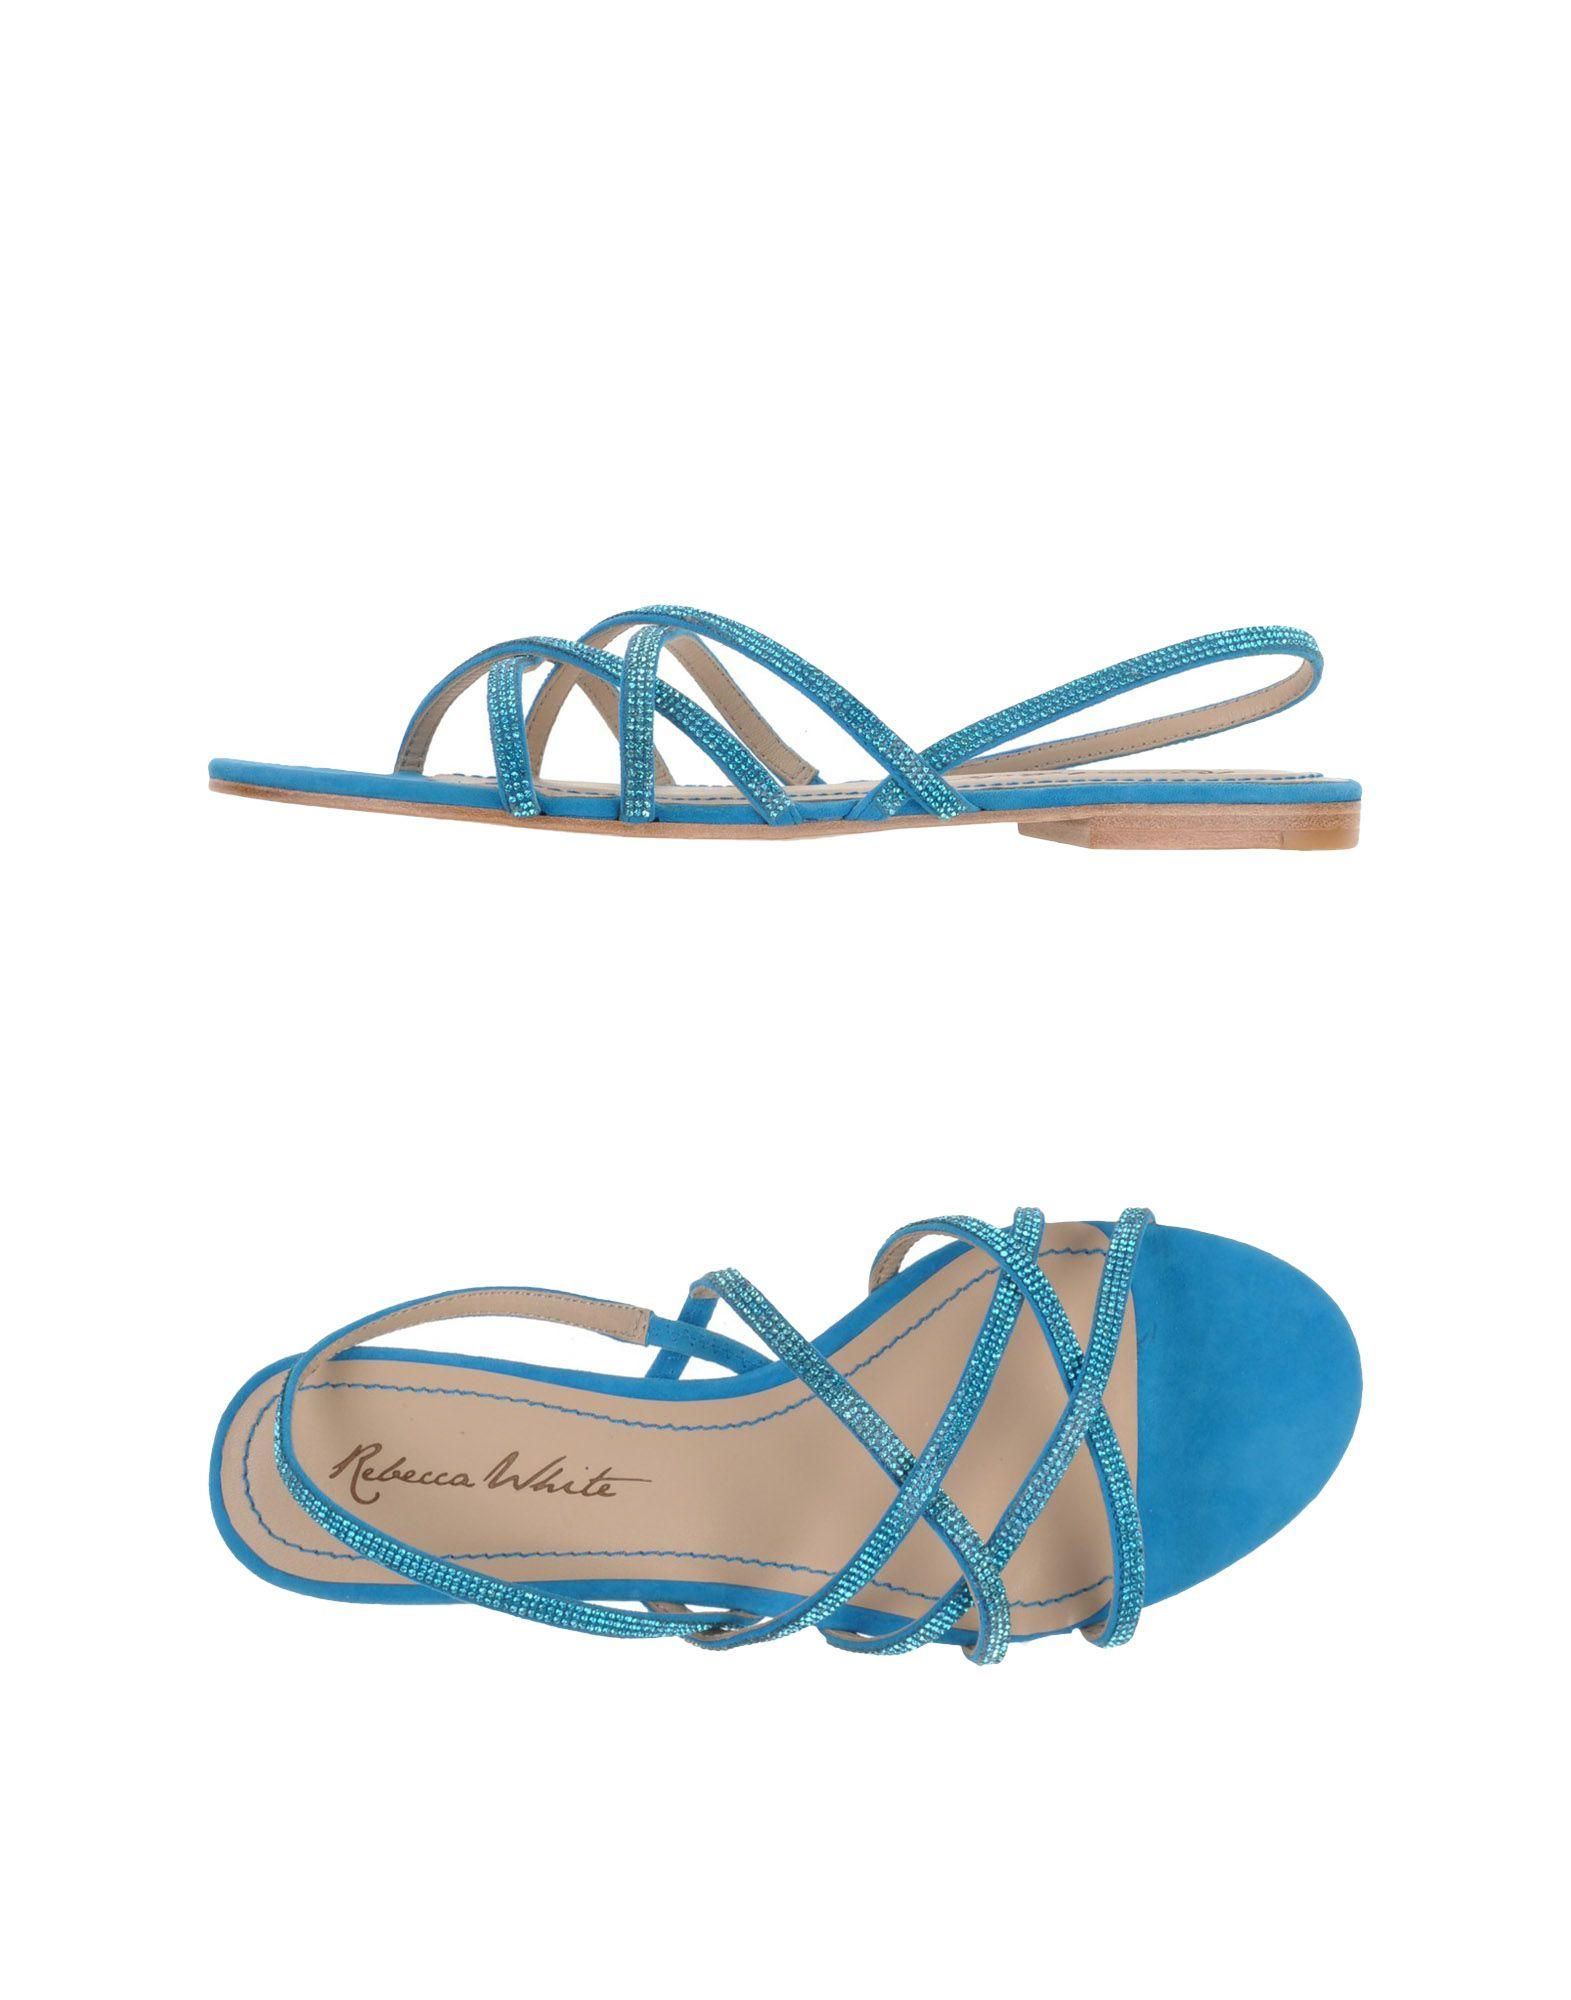 rebecca des sandales blanches - femmes rebecca rebecca rebecca des sandales blanches en ligne sur l'australie - 44788395gl 98127e